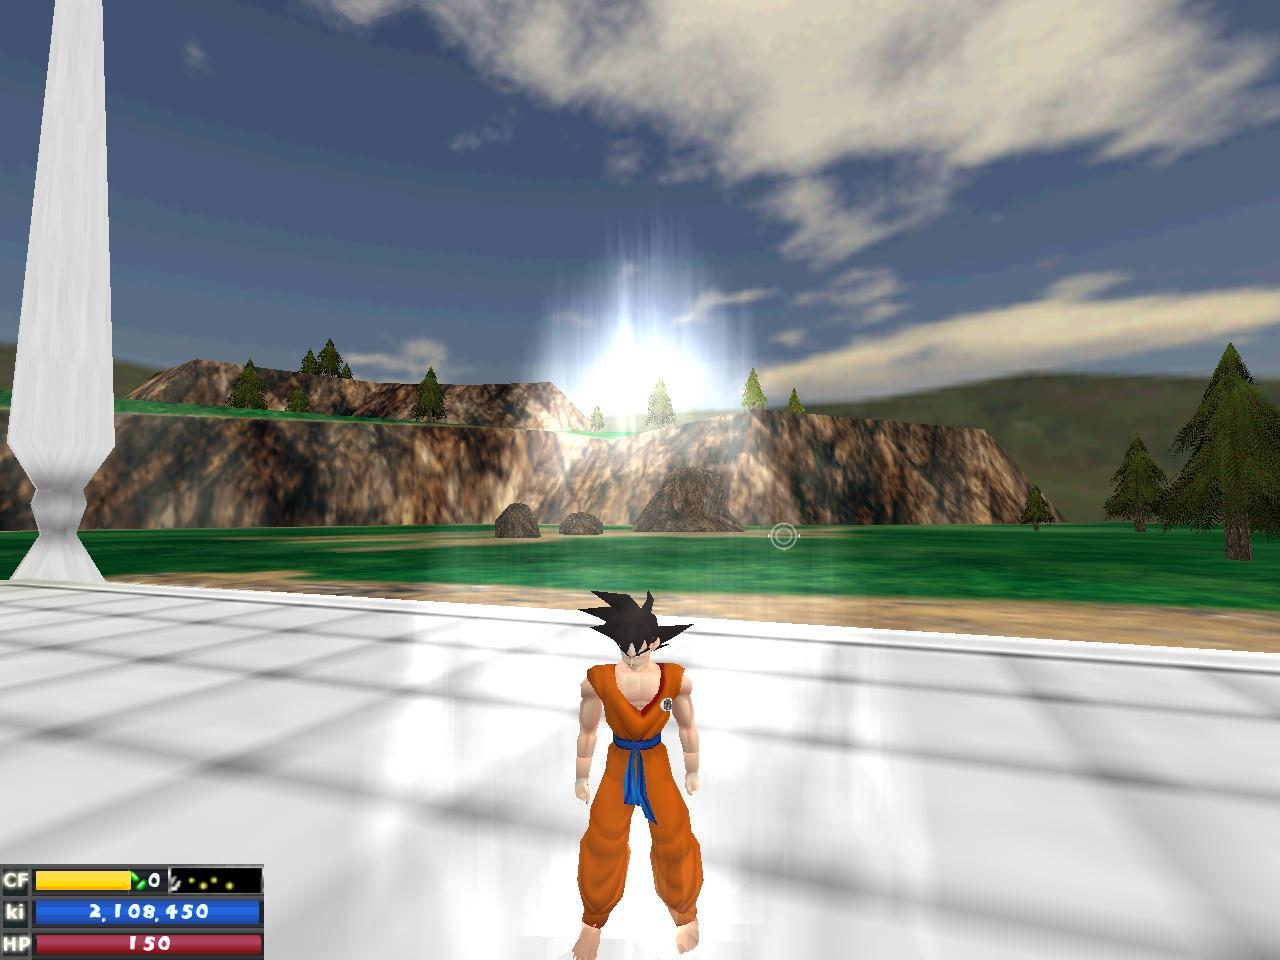 [Model con amxx] (Resubido) Goku sin pesas (vs radditz) by Matias_Esf - Página 2 2ch4ar6